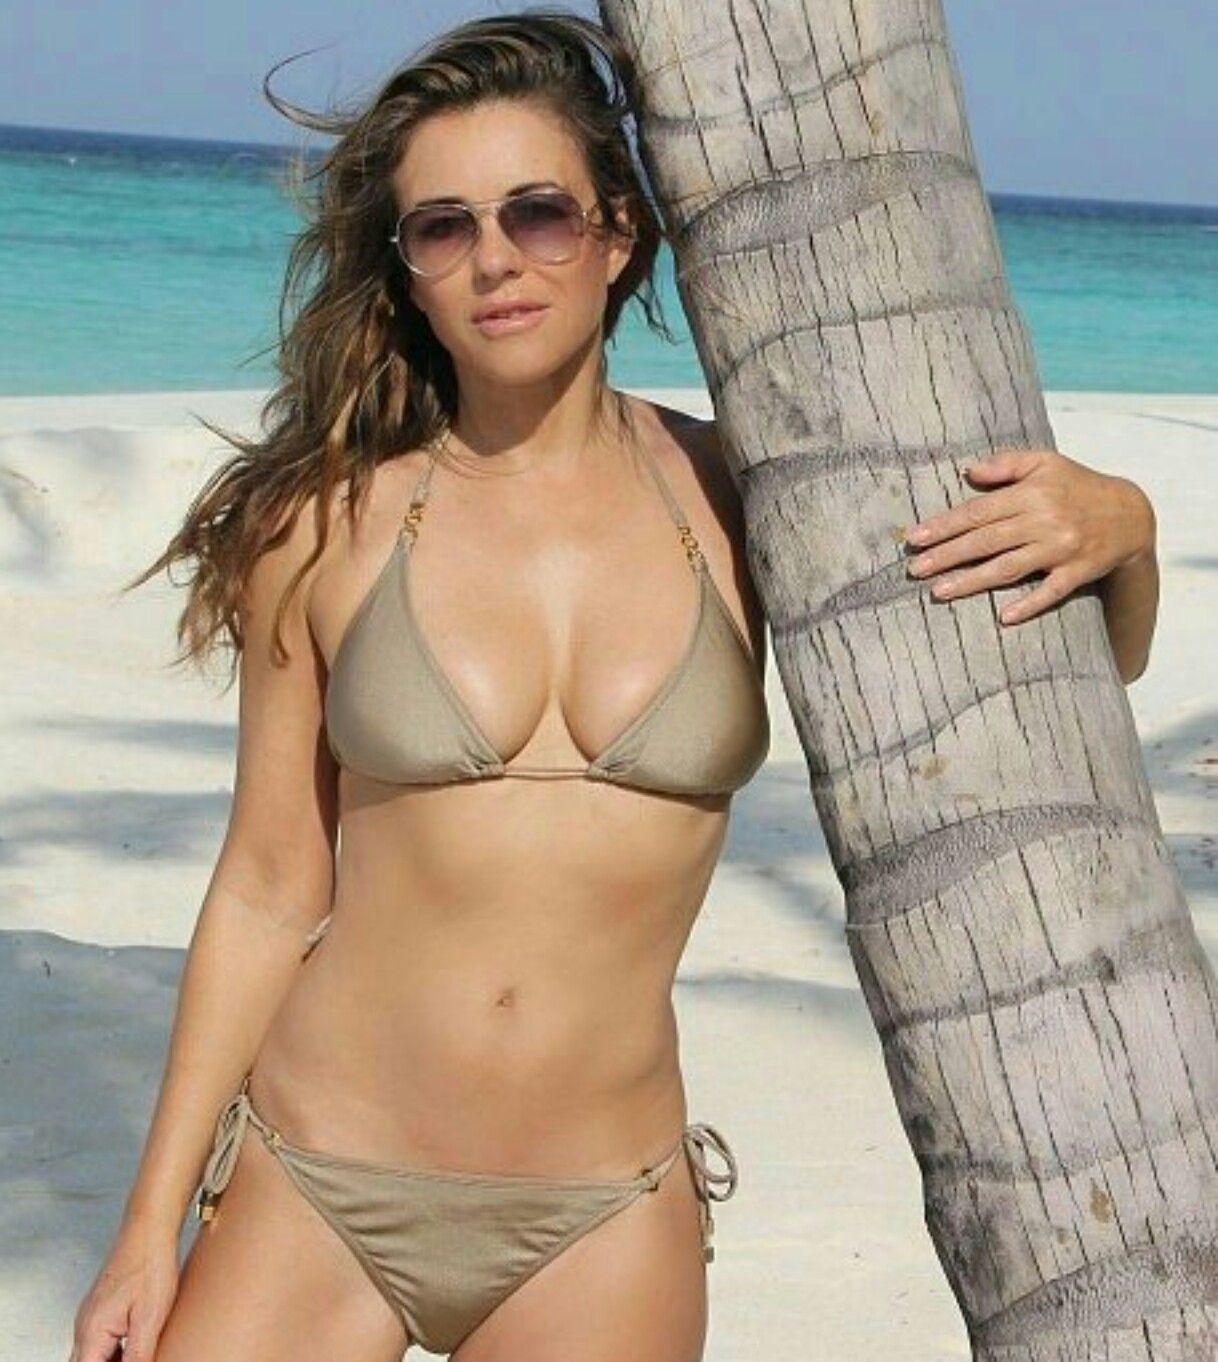 Bikini Elizabeth Audrey naked (67 photo), Sexy, Bikini, Selfie, legs 2006